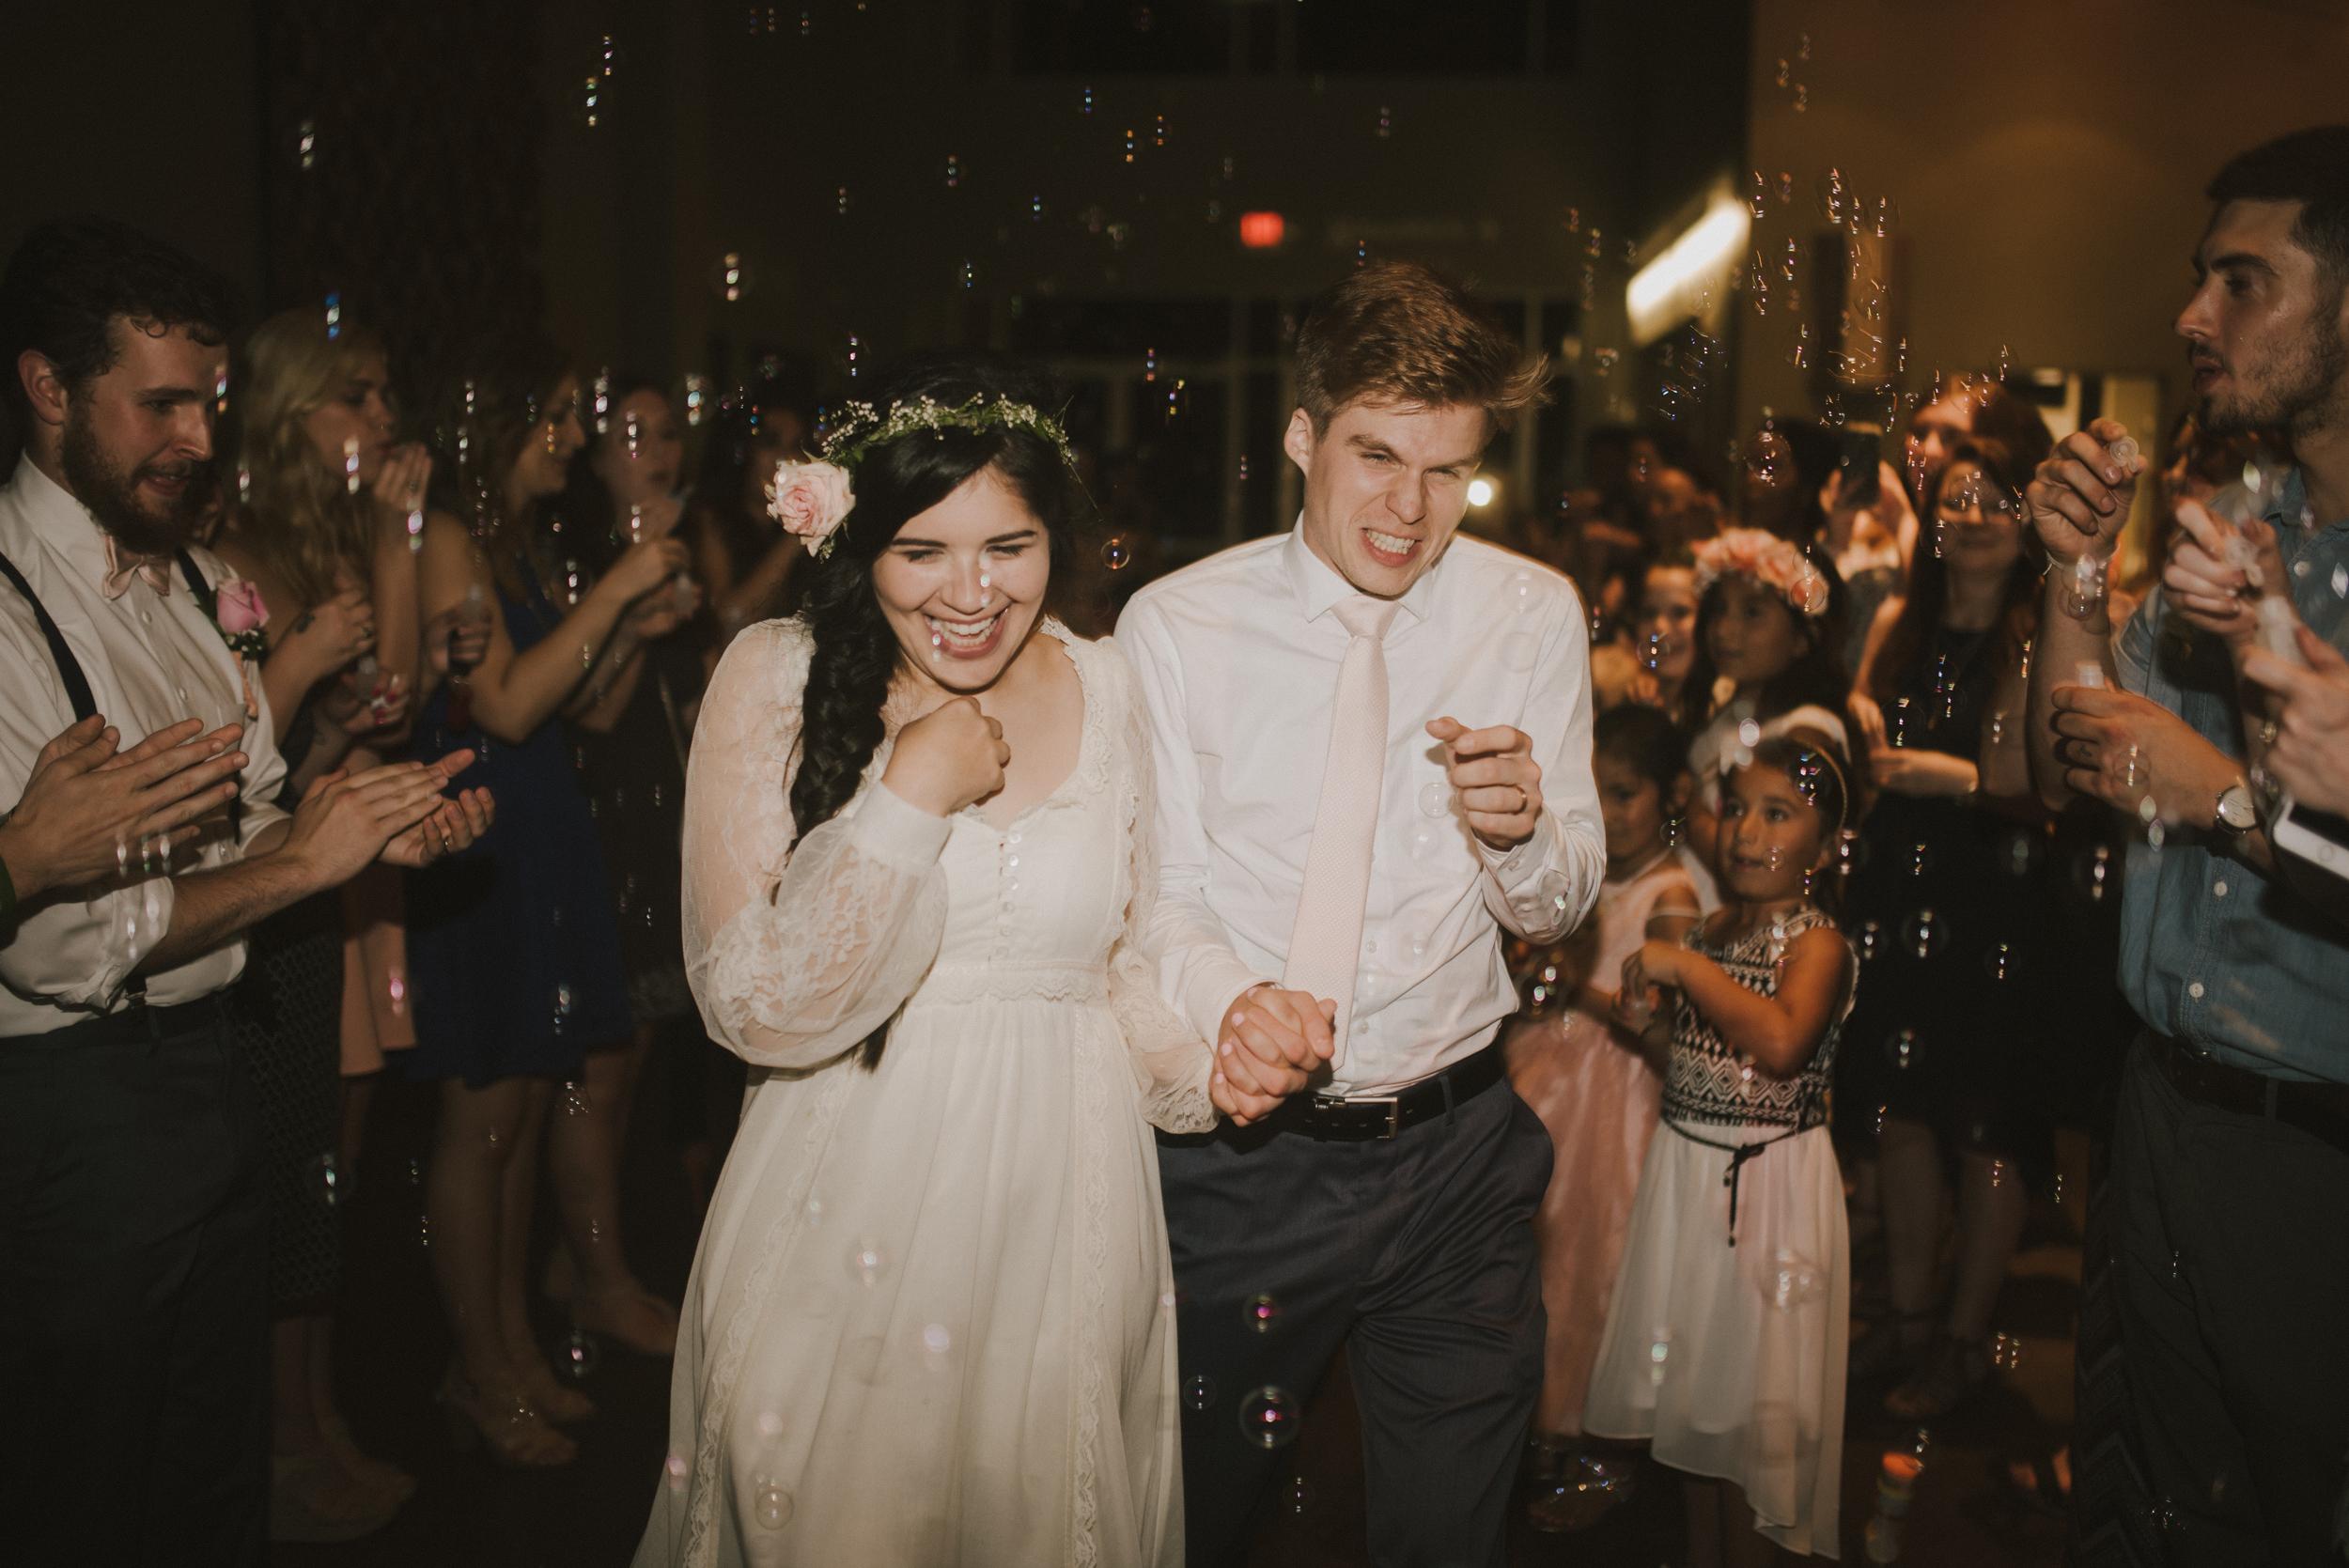 ofRen_weddingphotographer-171.jpg